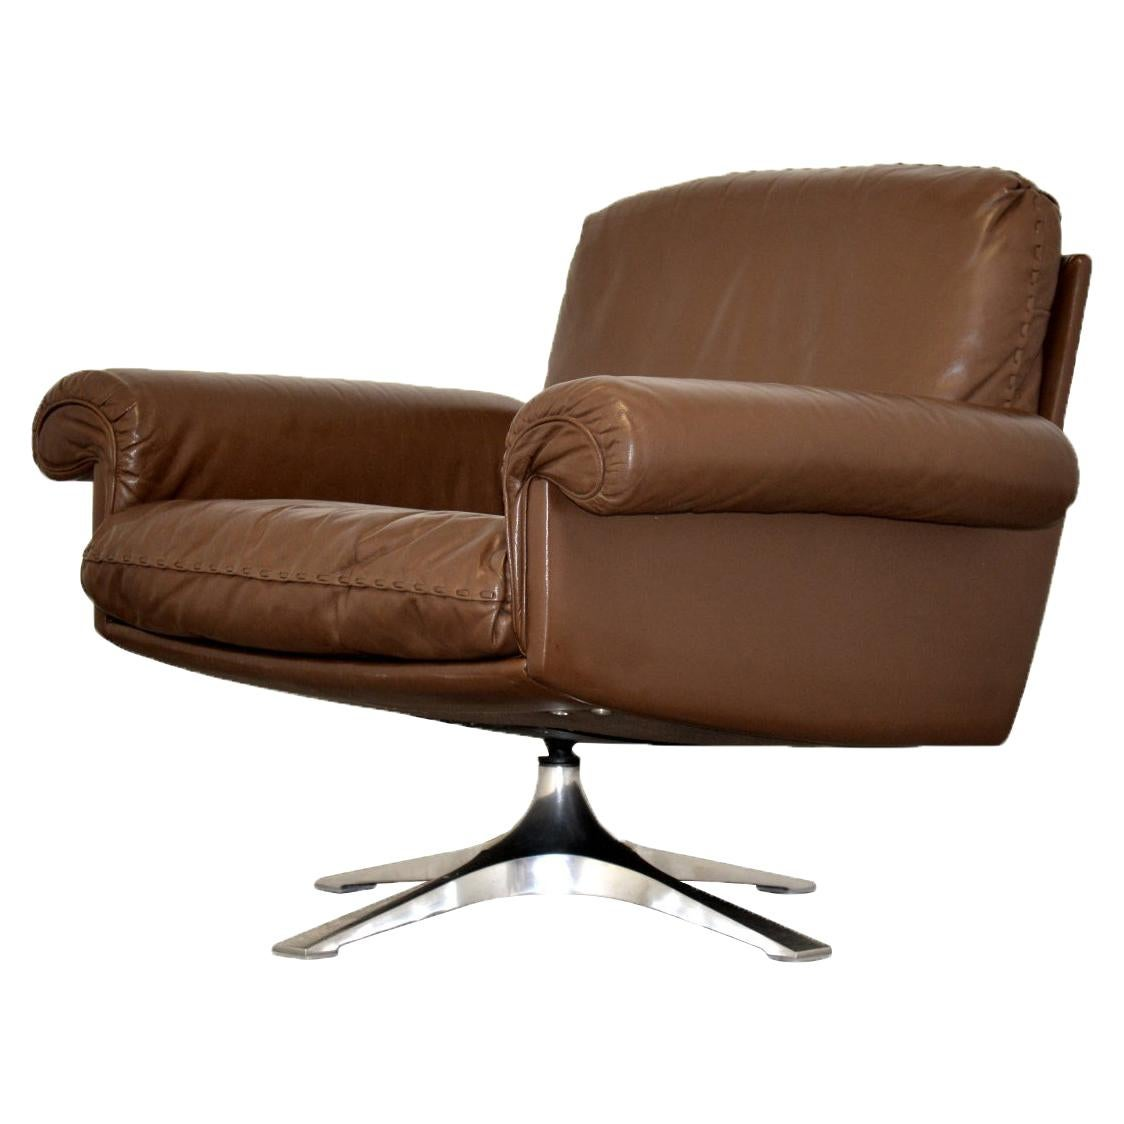 Vintage De Sede DS 31 Leather Swivel Lounge Armchair, Switzerland, 1970s